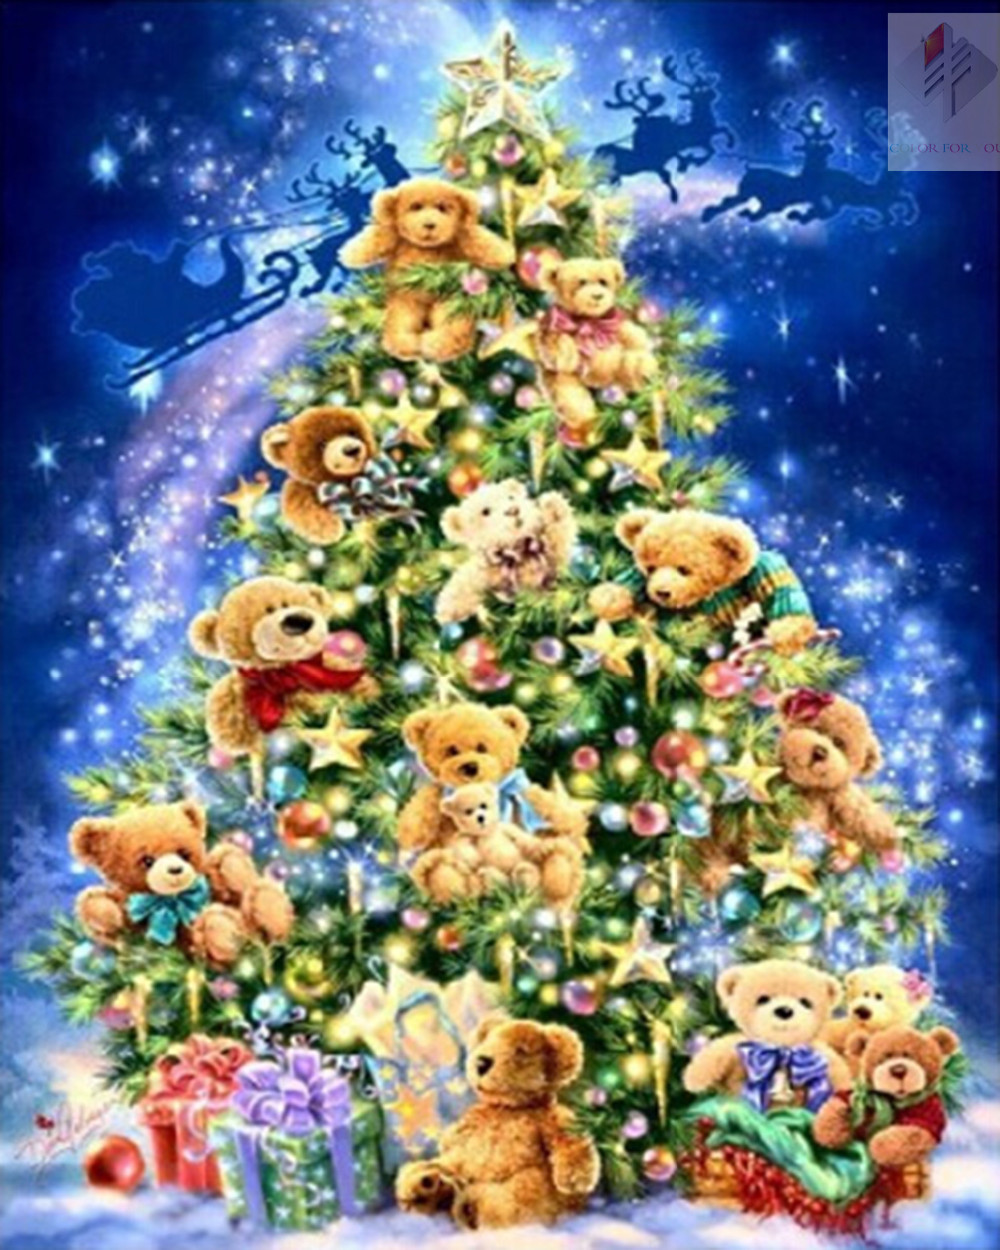 Bear Christmas tree diy diamond painting cross stitch full square drill canvas rhinestone diamond mosaic room decor wall sticker